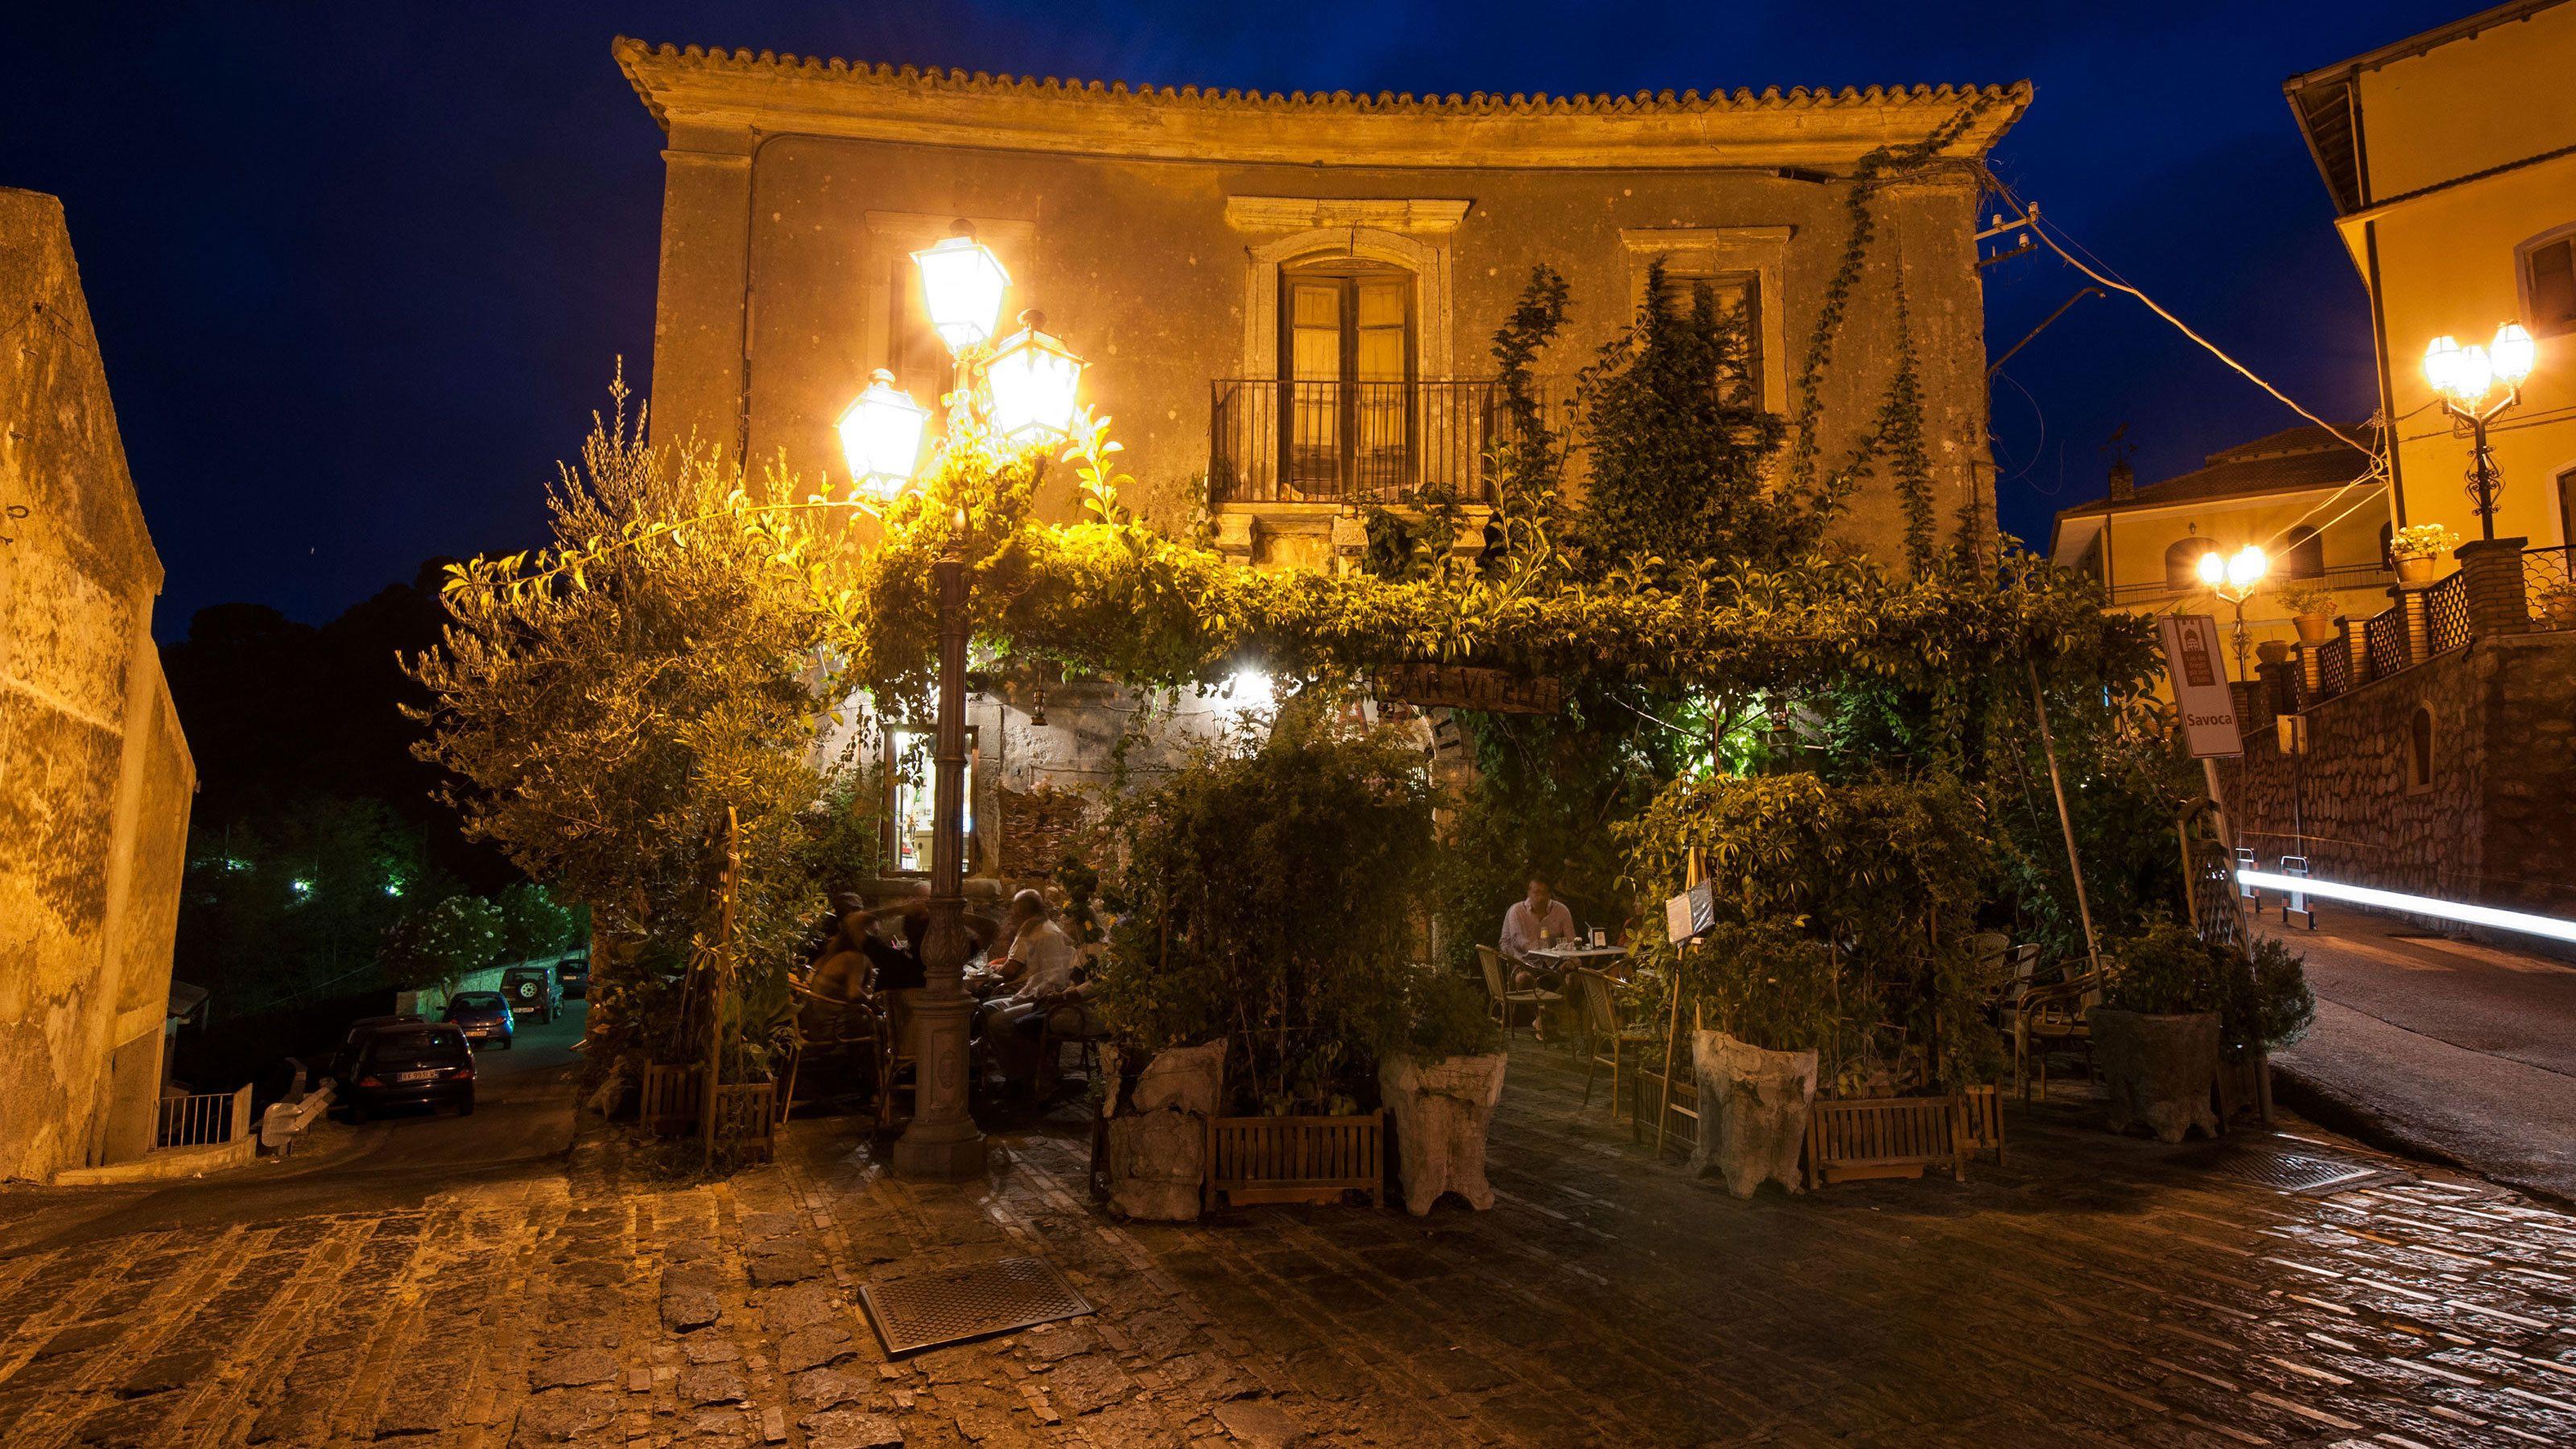 Outdoor cafe at night in Taormina